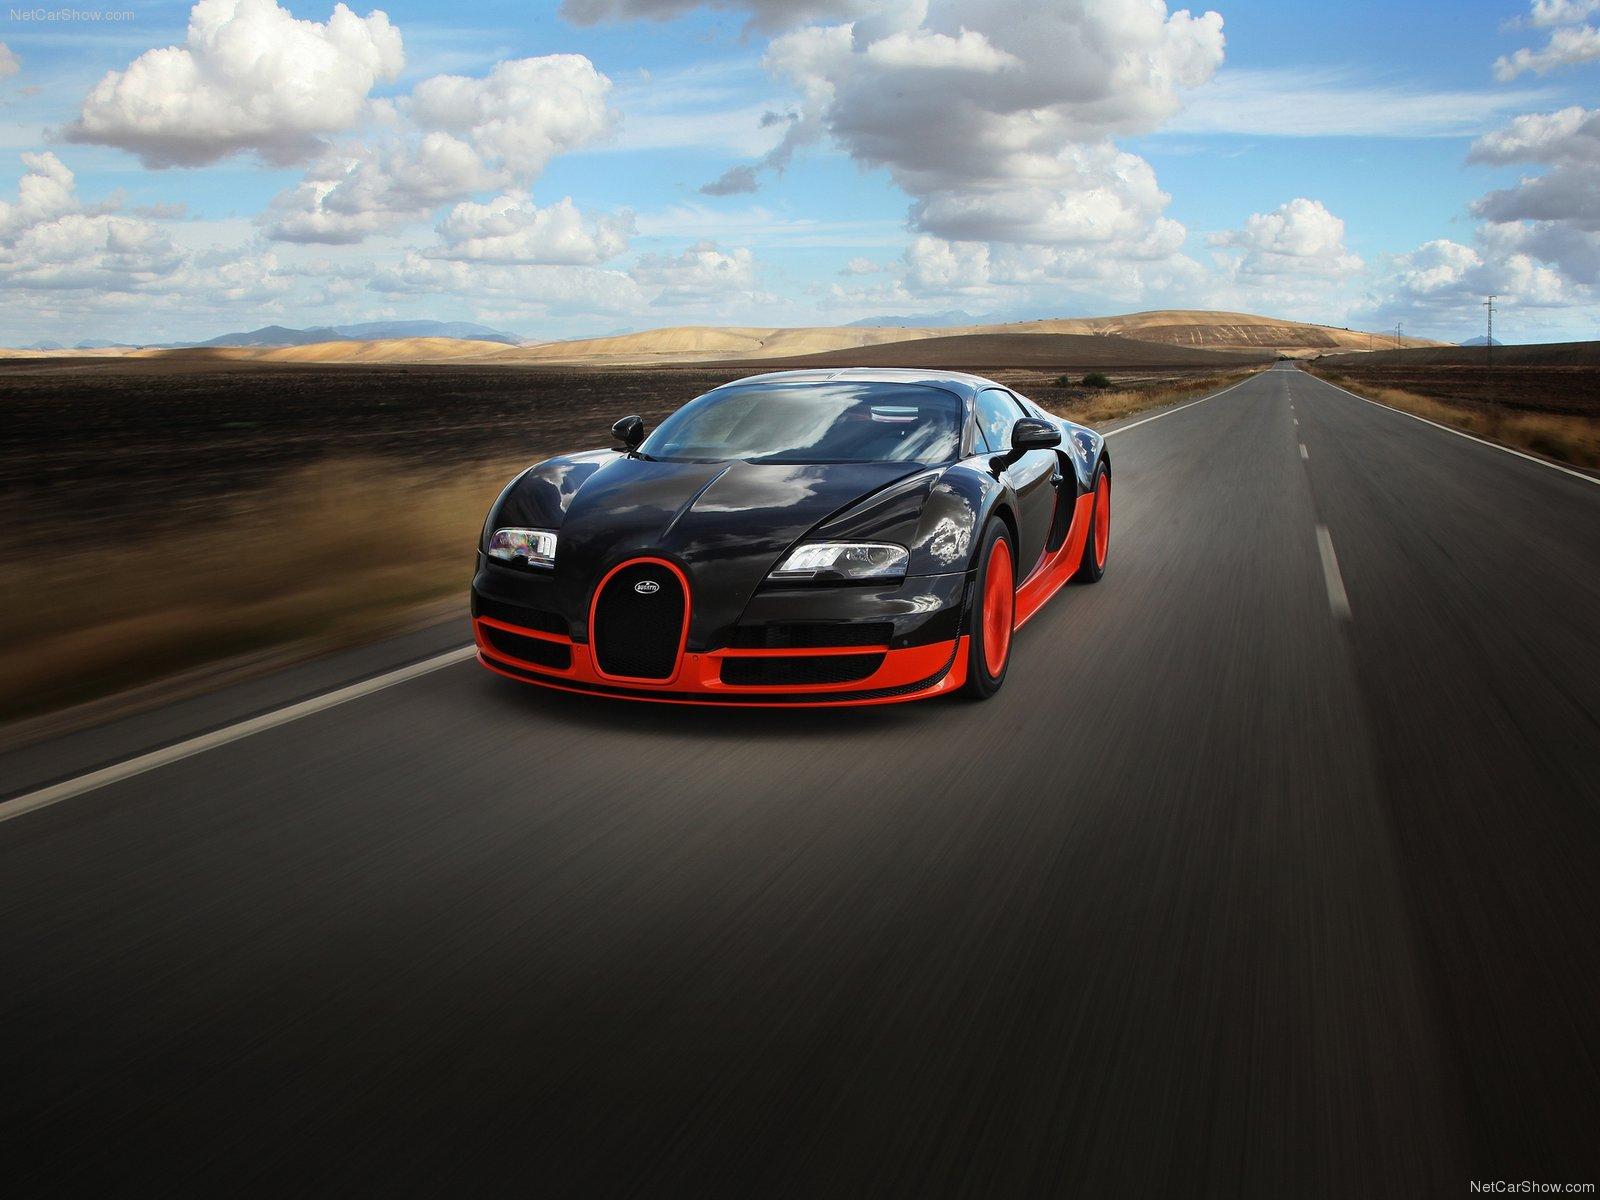 Bugatti-Veyron_Super_Sport_mp104_pic_77570 Inspiring Bugatti Veyron Quarter Mile Speed Cars Trend